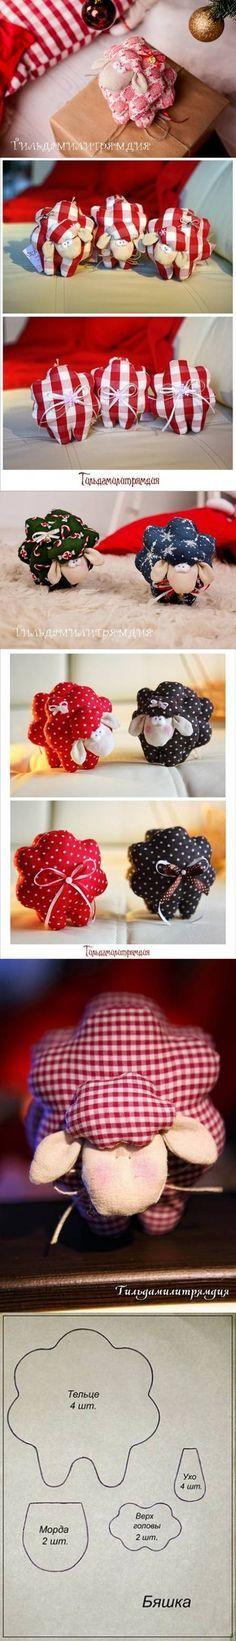 DIY Cute Fabric Lamb DIY Projects | UsefulDIY.com Follow Us on Facebook ==> http://www.facebook.com/UsefulDiy